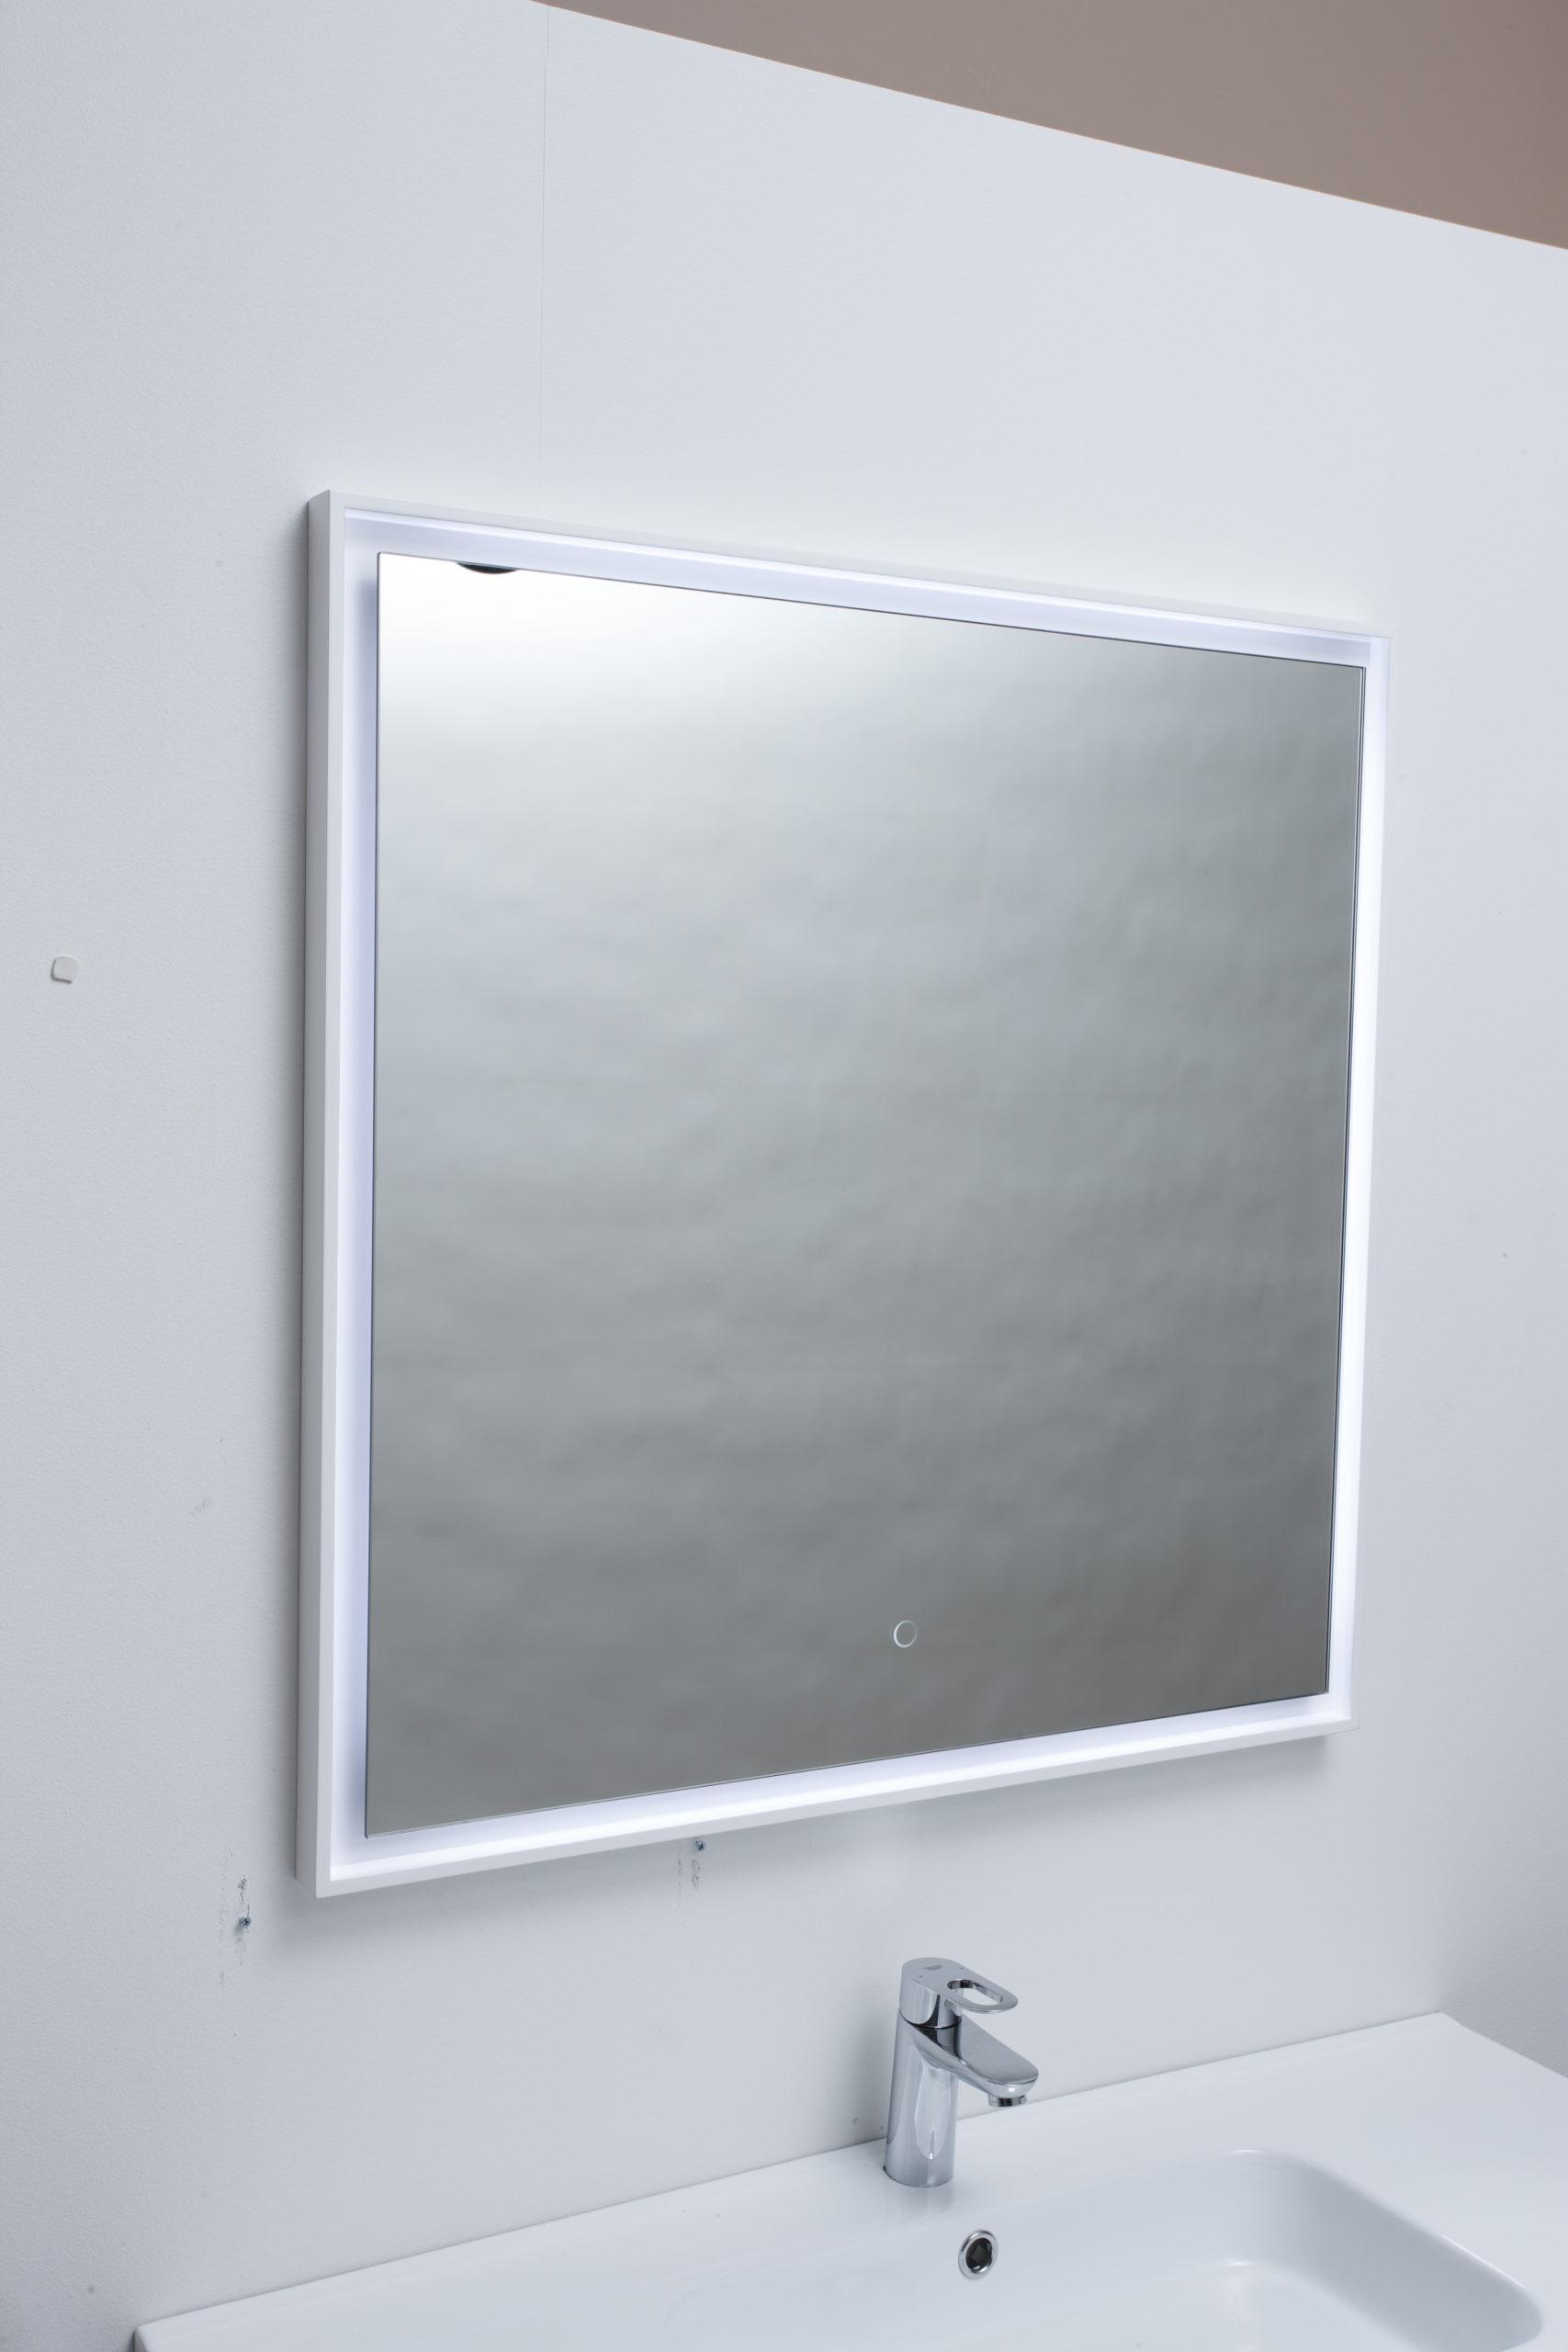 Spar Nu 50 Pa Fano Spejl I Hvid Ramme Firkantet Fano Spejl I Ramme